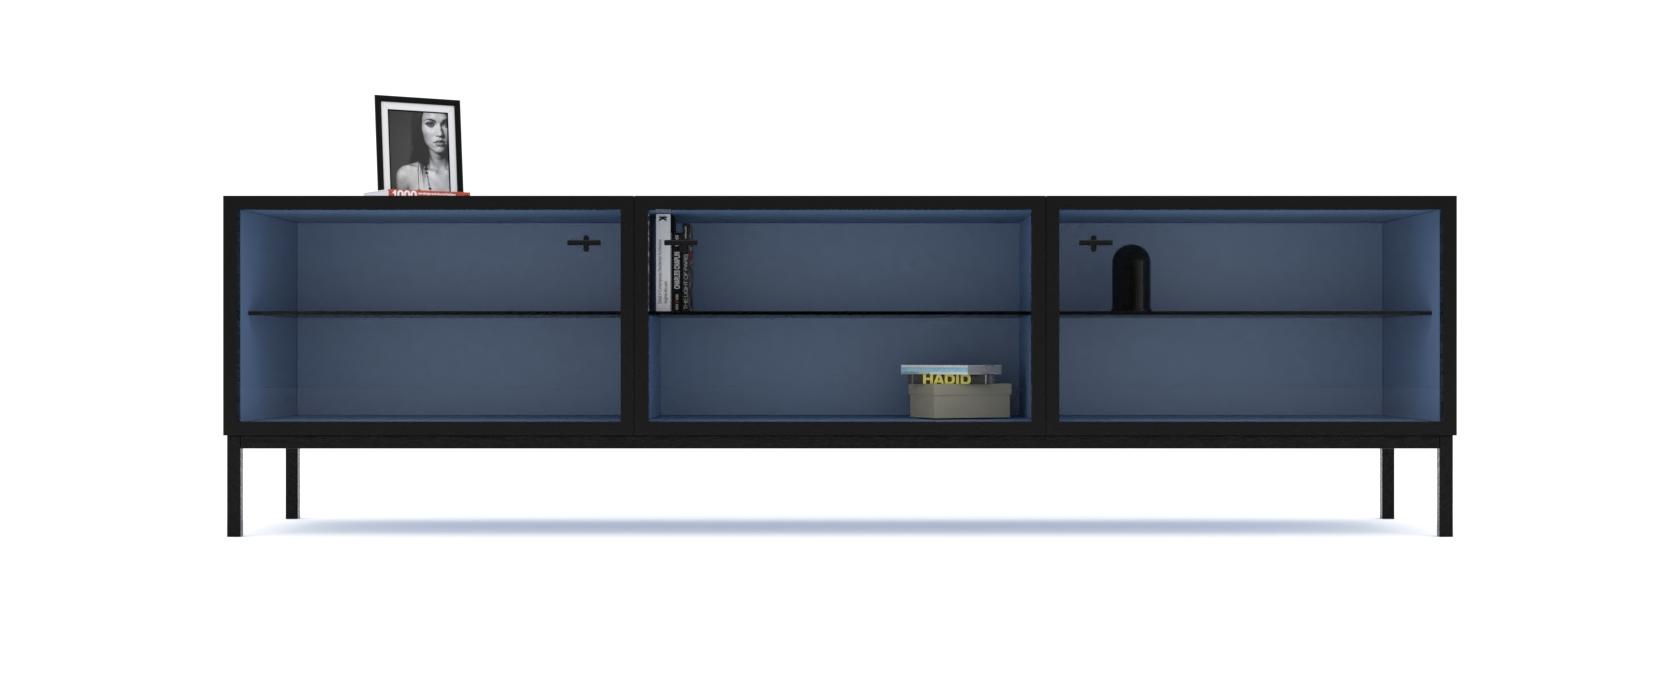 Тумба под медиа Rollini с 3 стеклянными фасадами - Pufetto